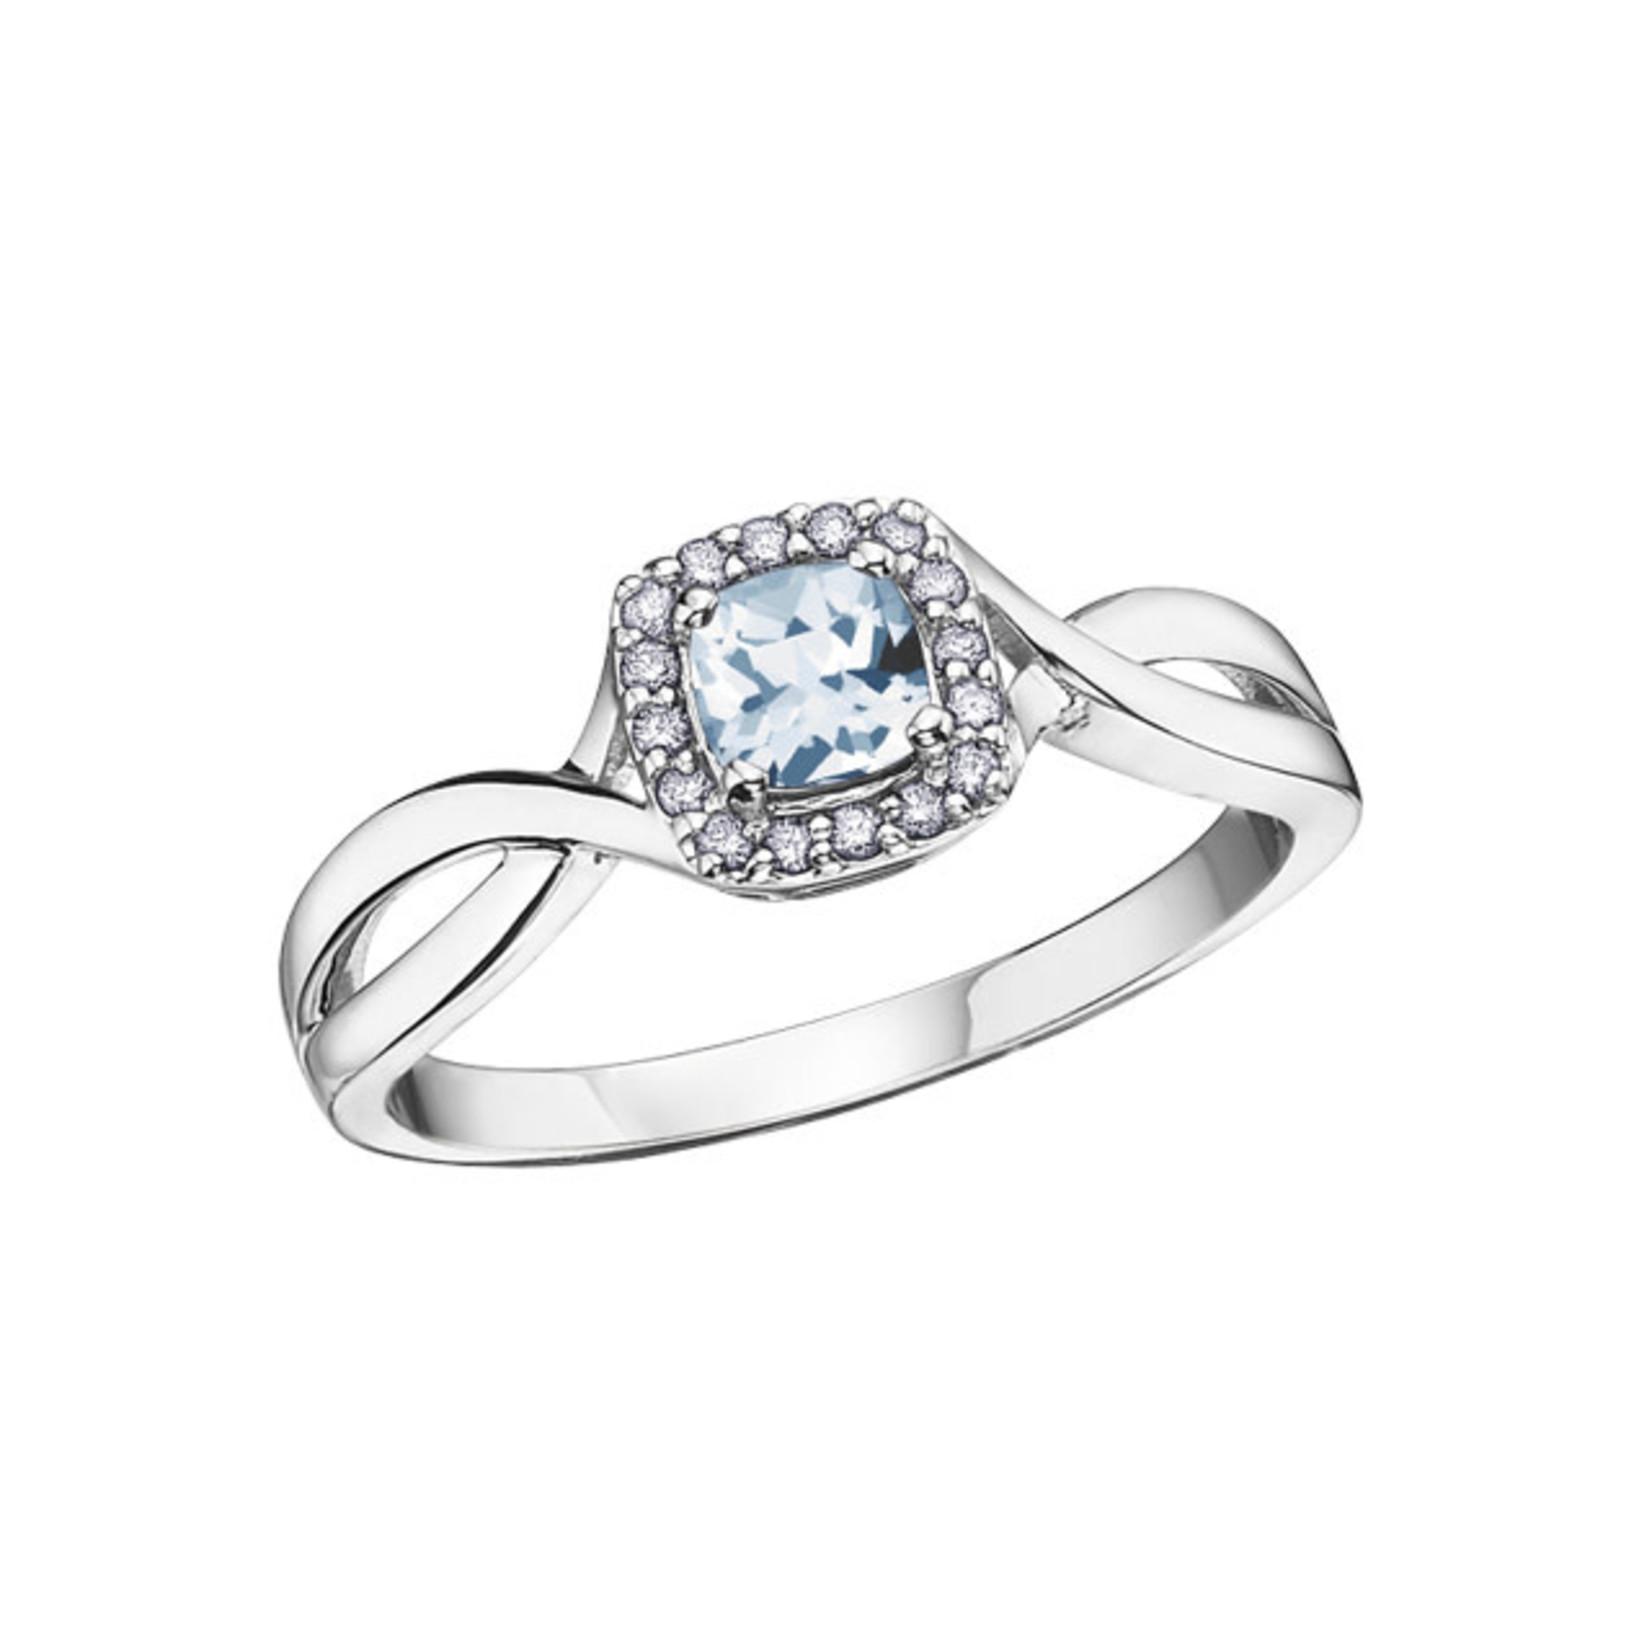 Aquamarine and Diamond Ring 0.20 ct. T.W.